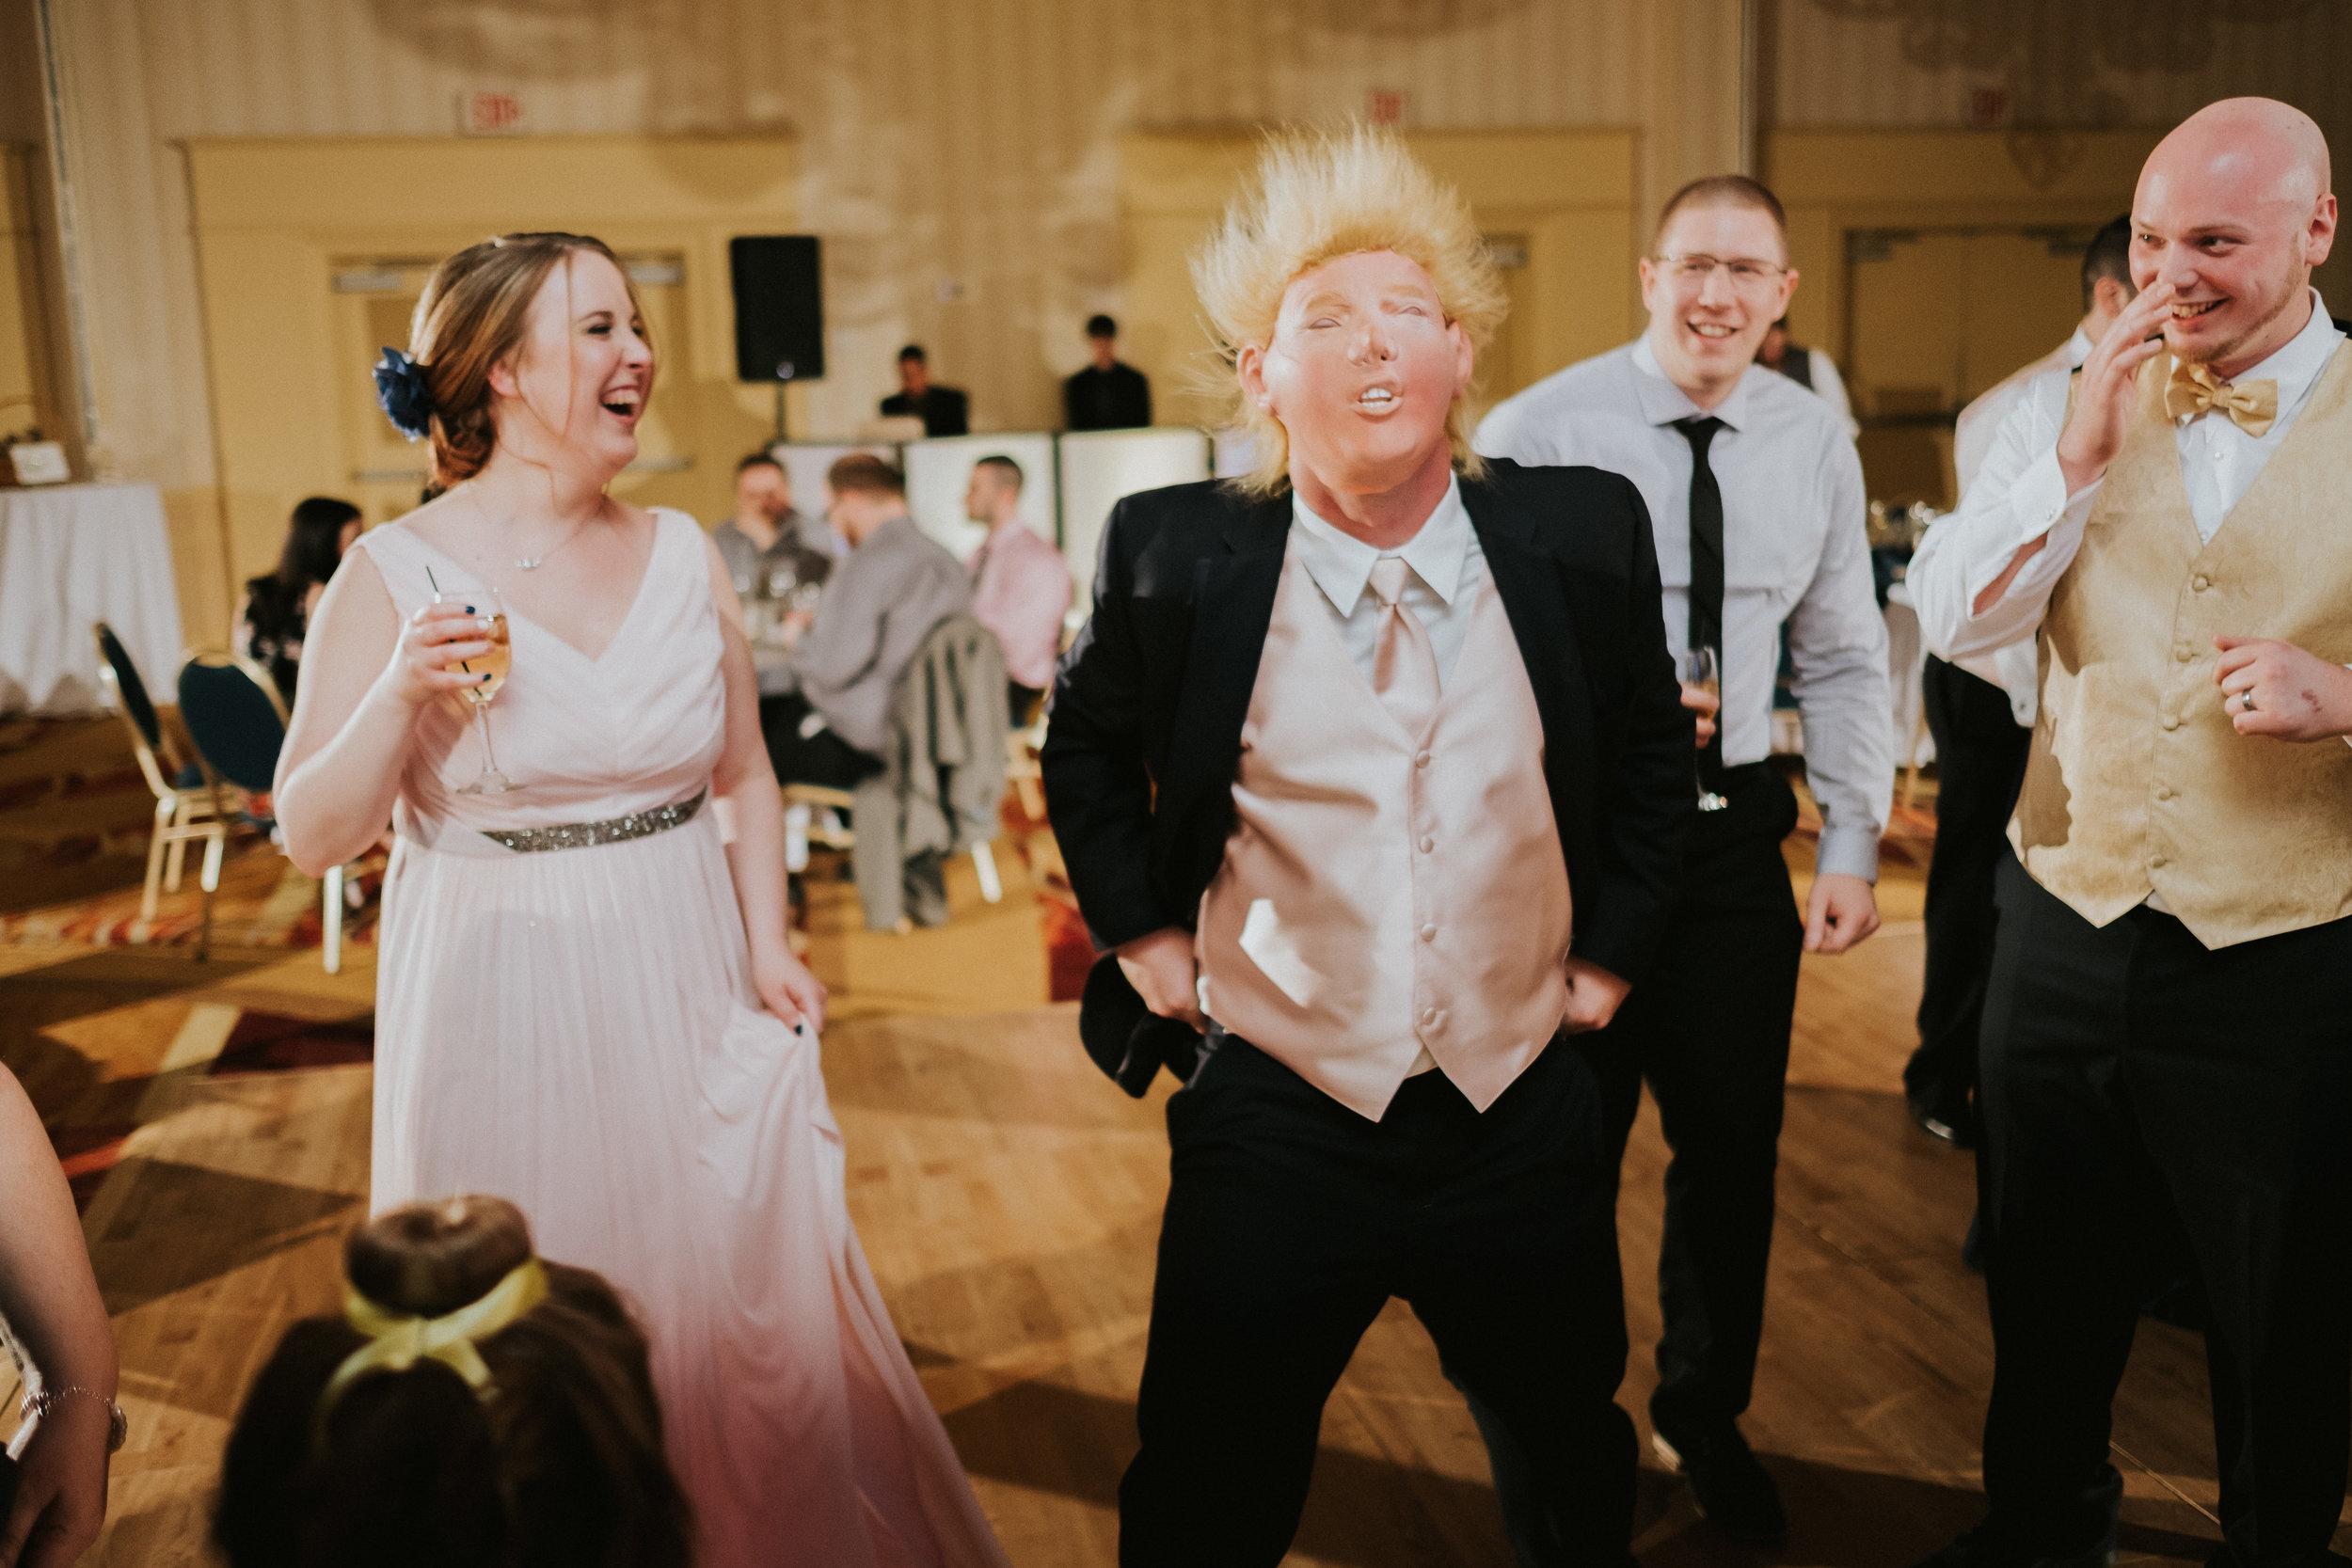 Barclay-Farmstead-Wedding-Rosa-and-Mike-657.jpg